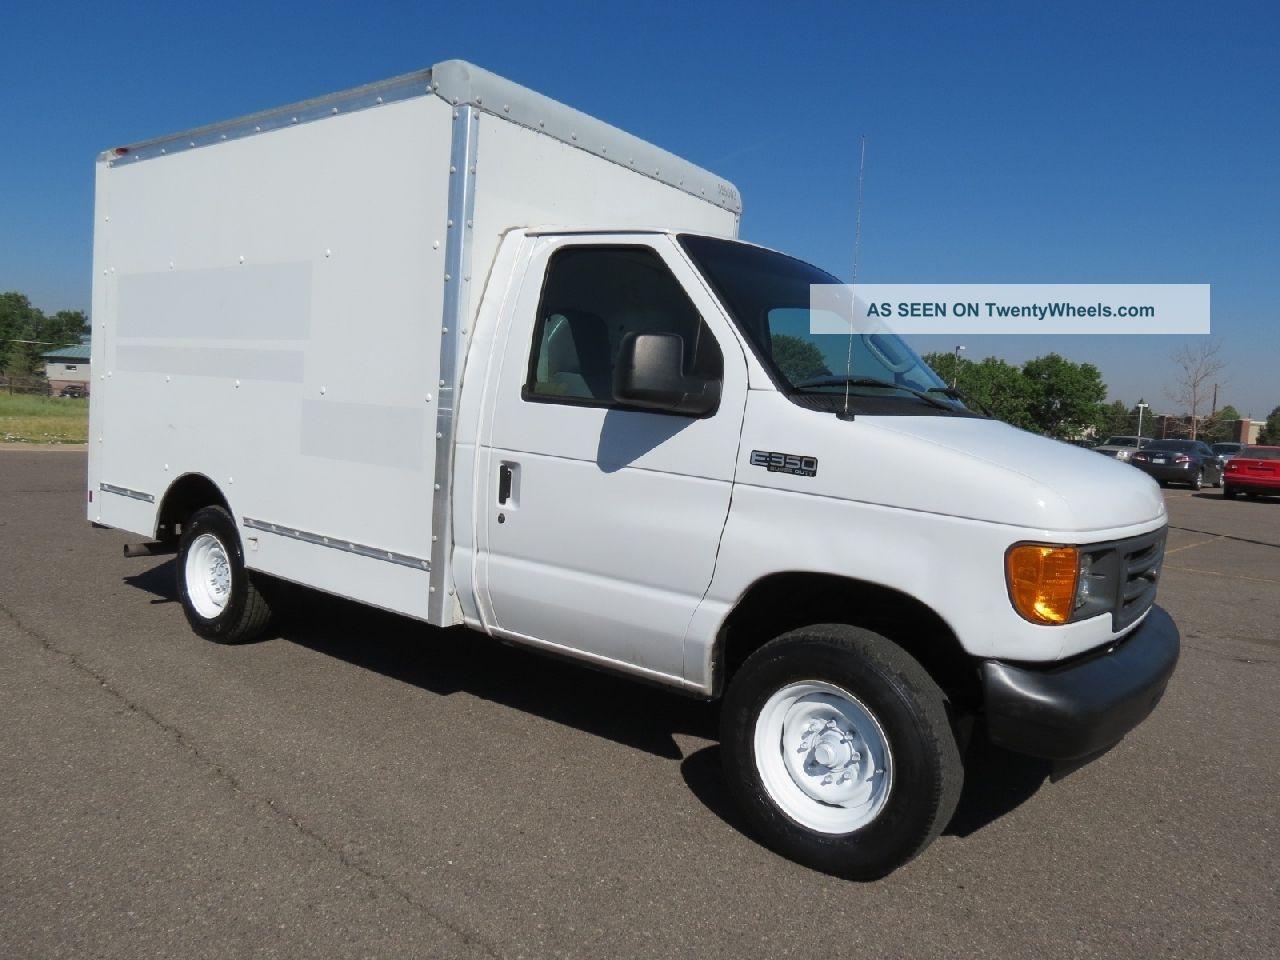 2005 ford e350 service utility work van delivery box truck. Black Bedroom Furniture Sets. Home Design Ideas